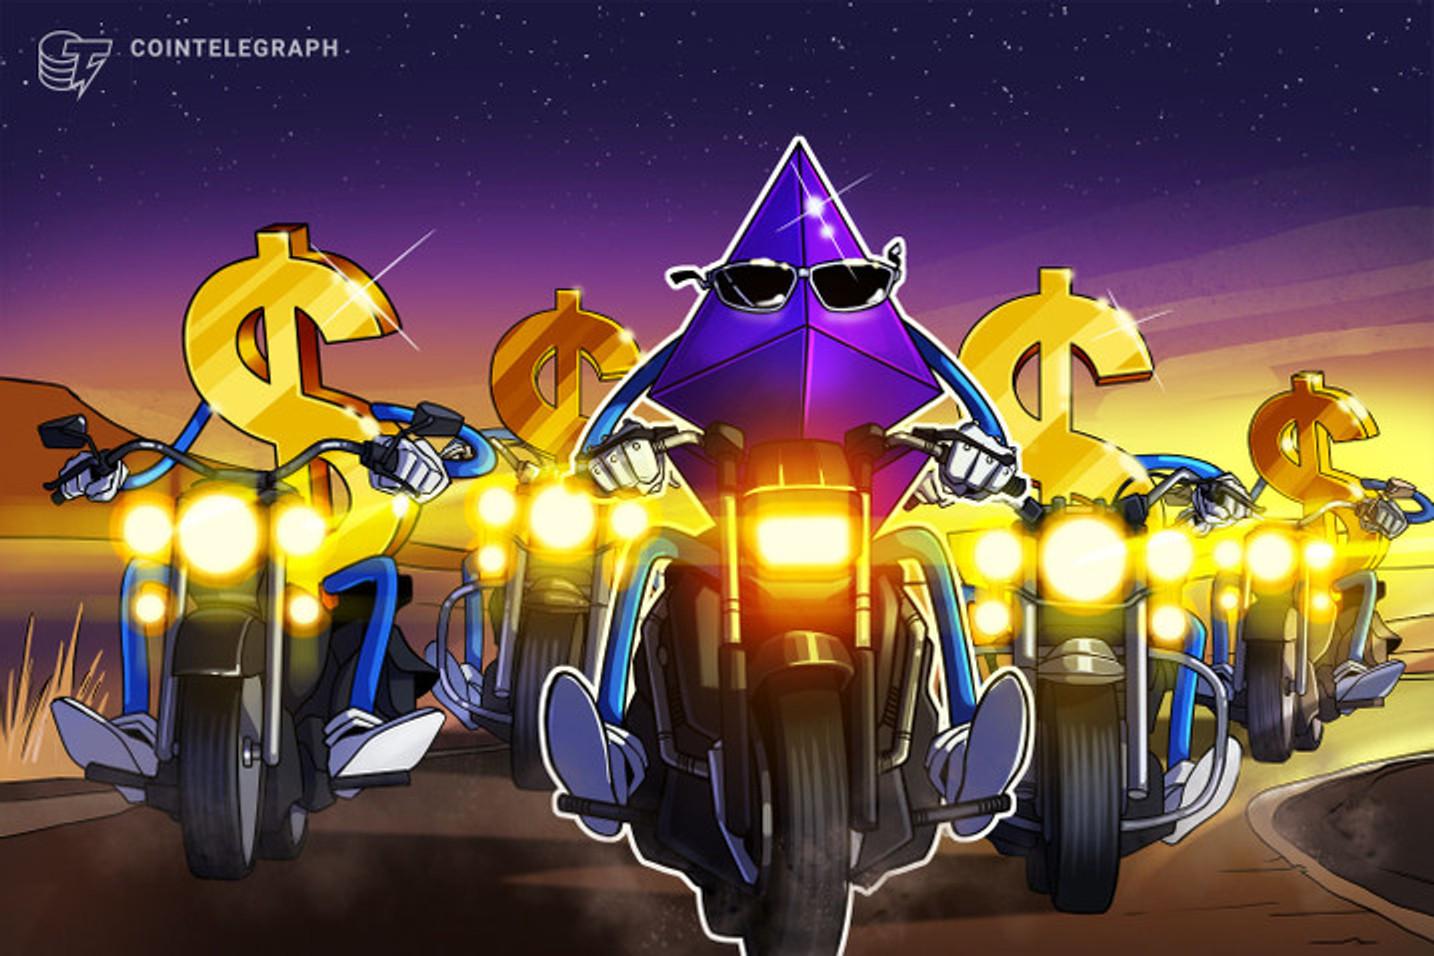 Porque o Ethereum pode se tornar o ativo mais importante para investidores cripto e tradicionais